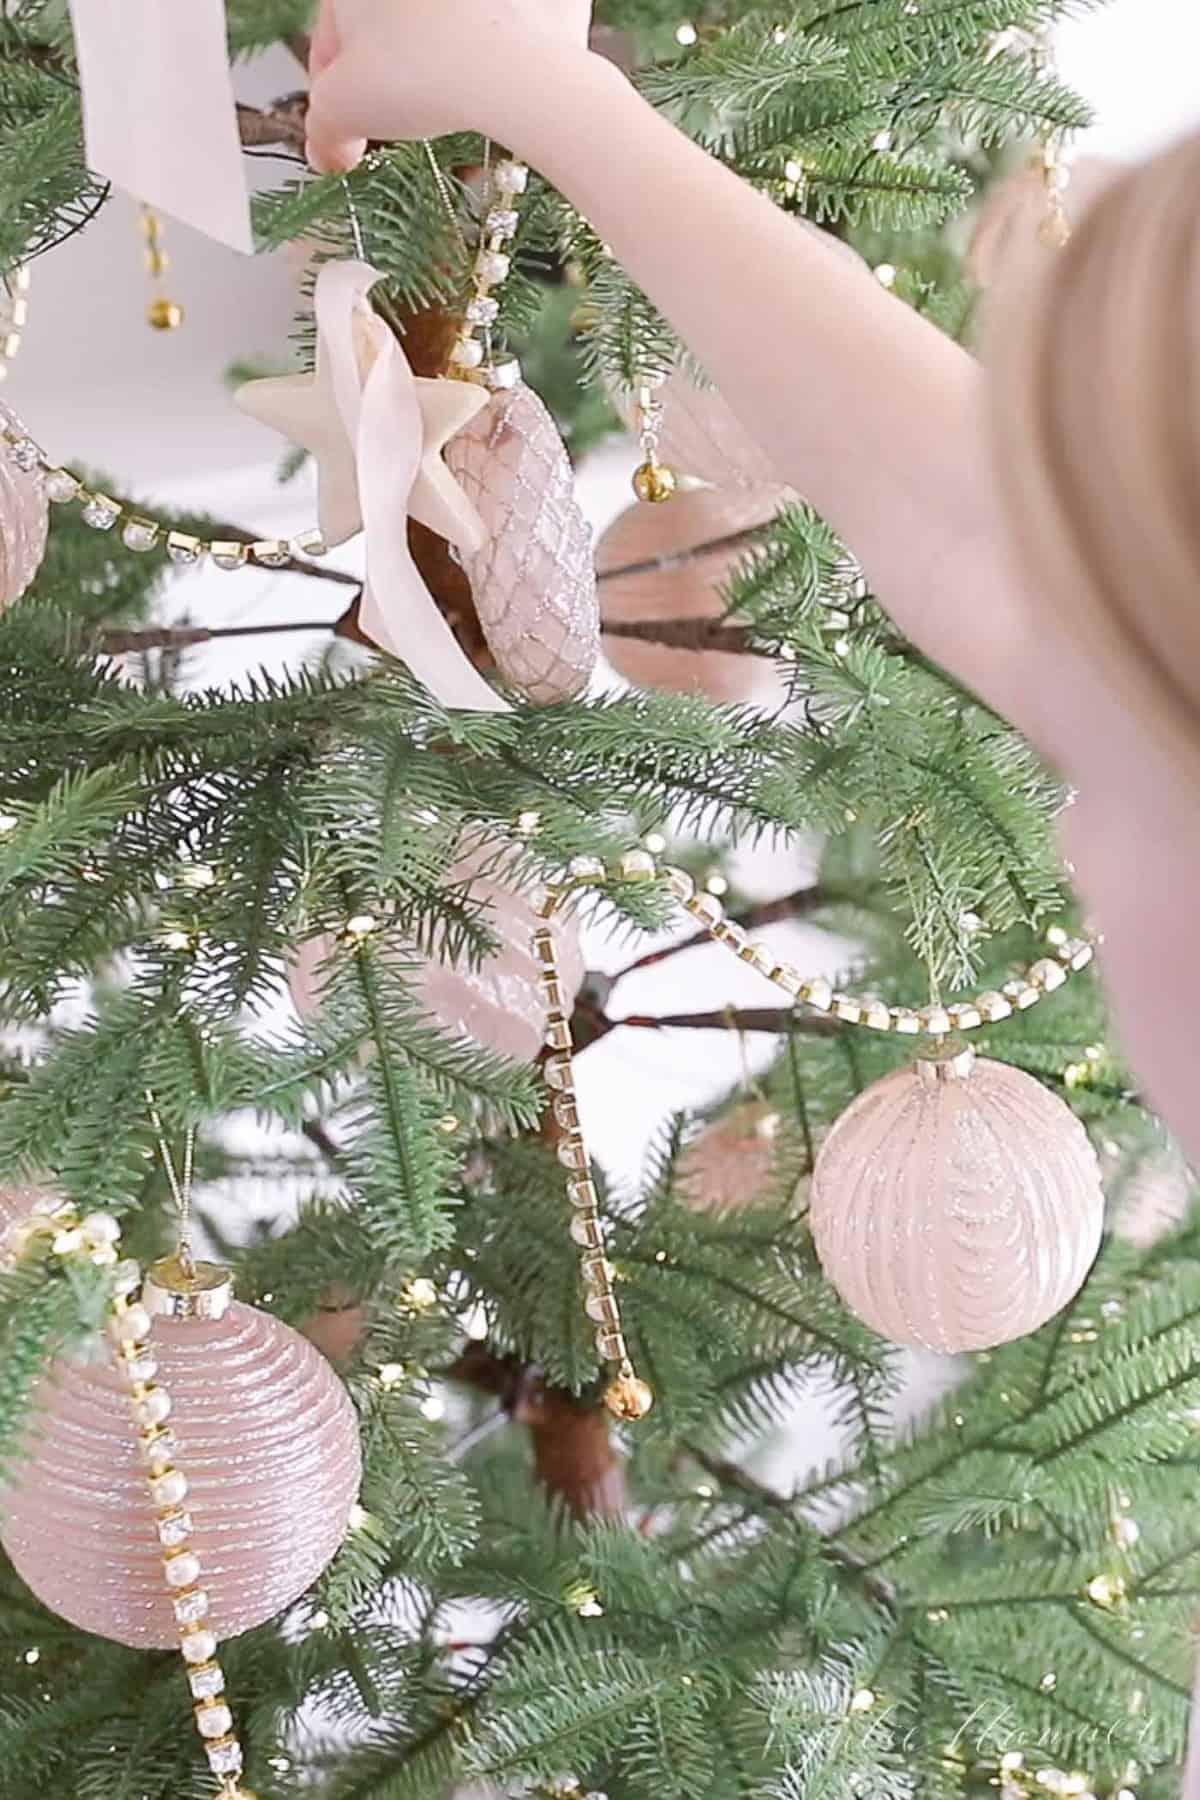 The Best Salt Dough Ornaments (with